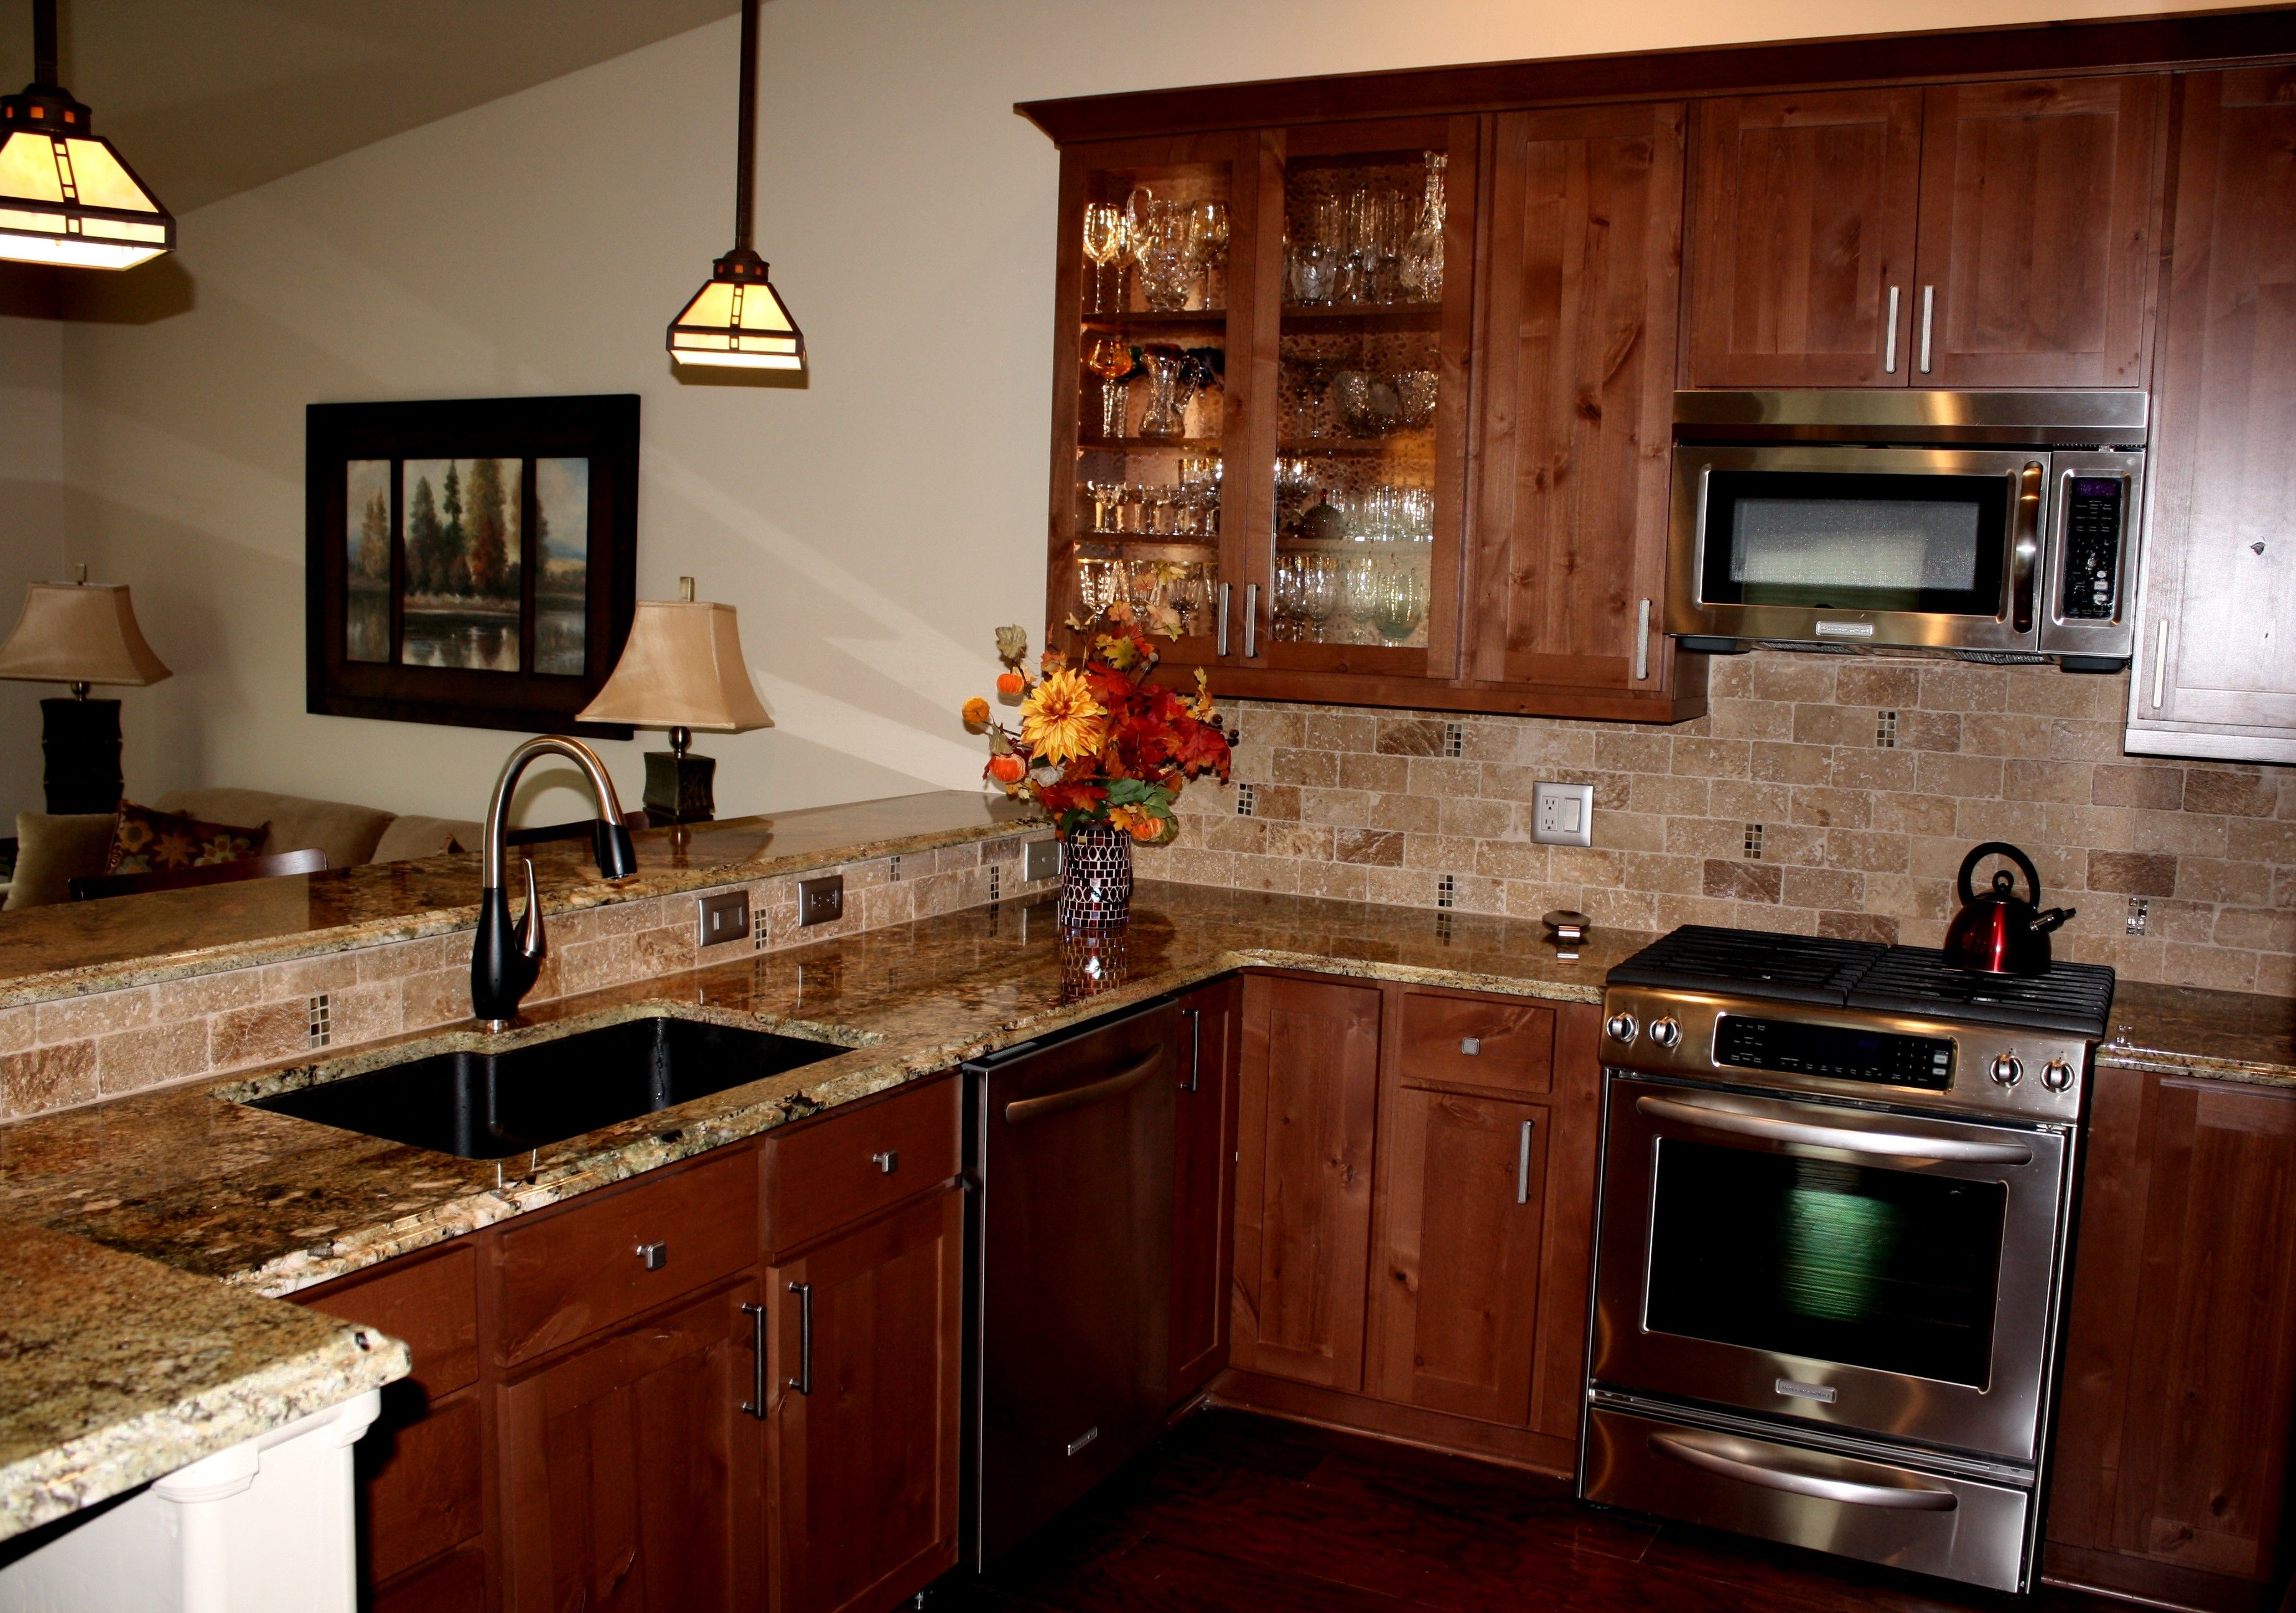 Carnival Granite With Tumbled Travertine Backsplash Kitchen